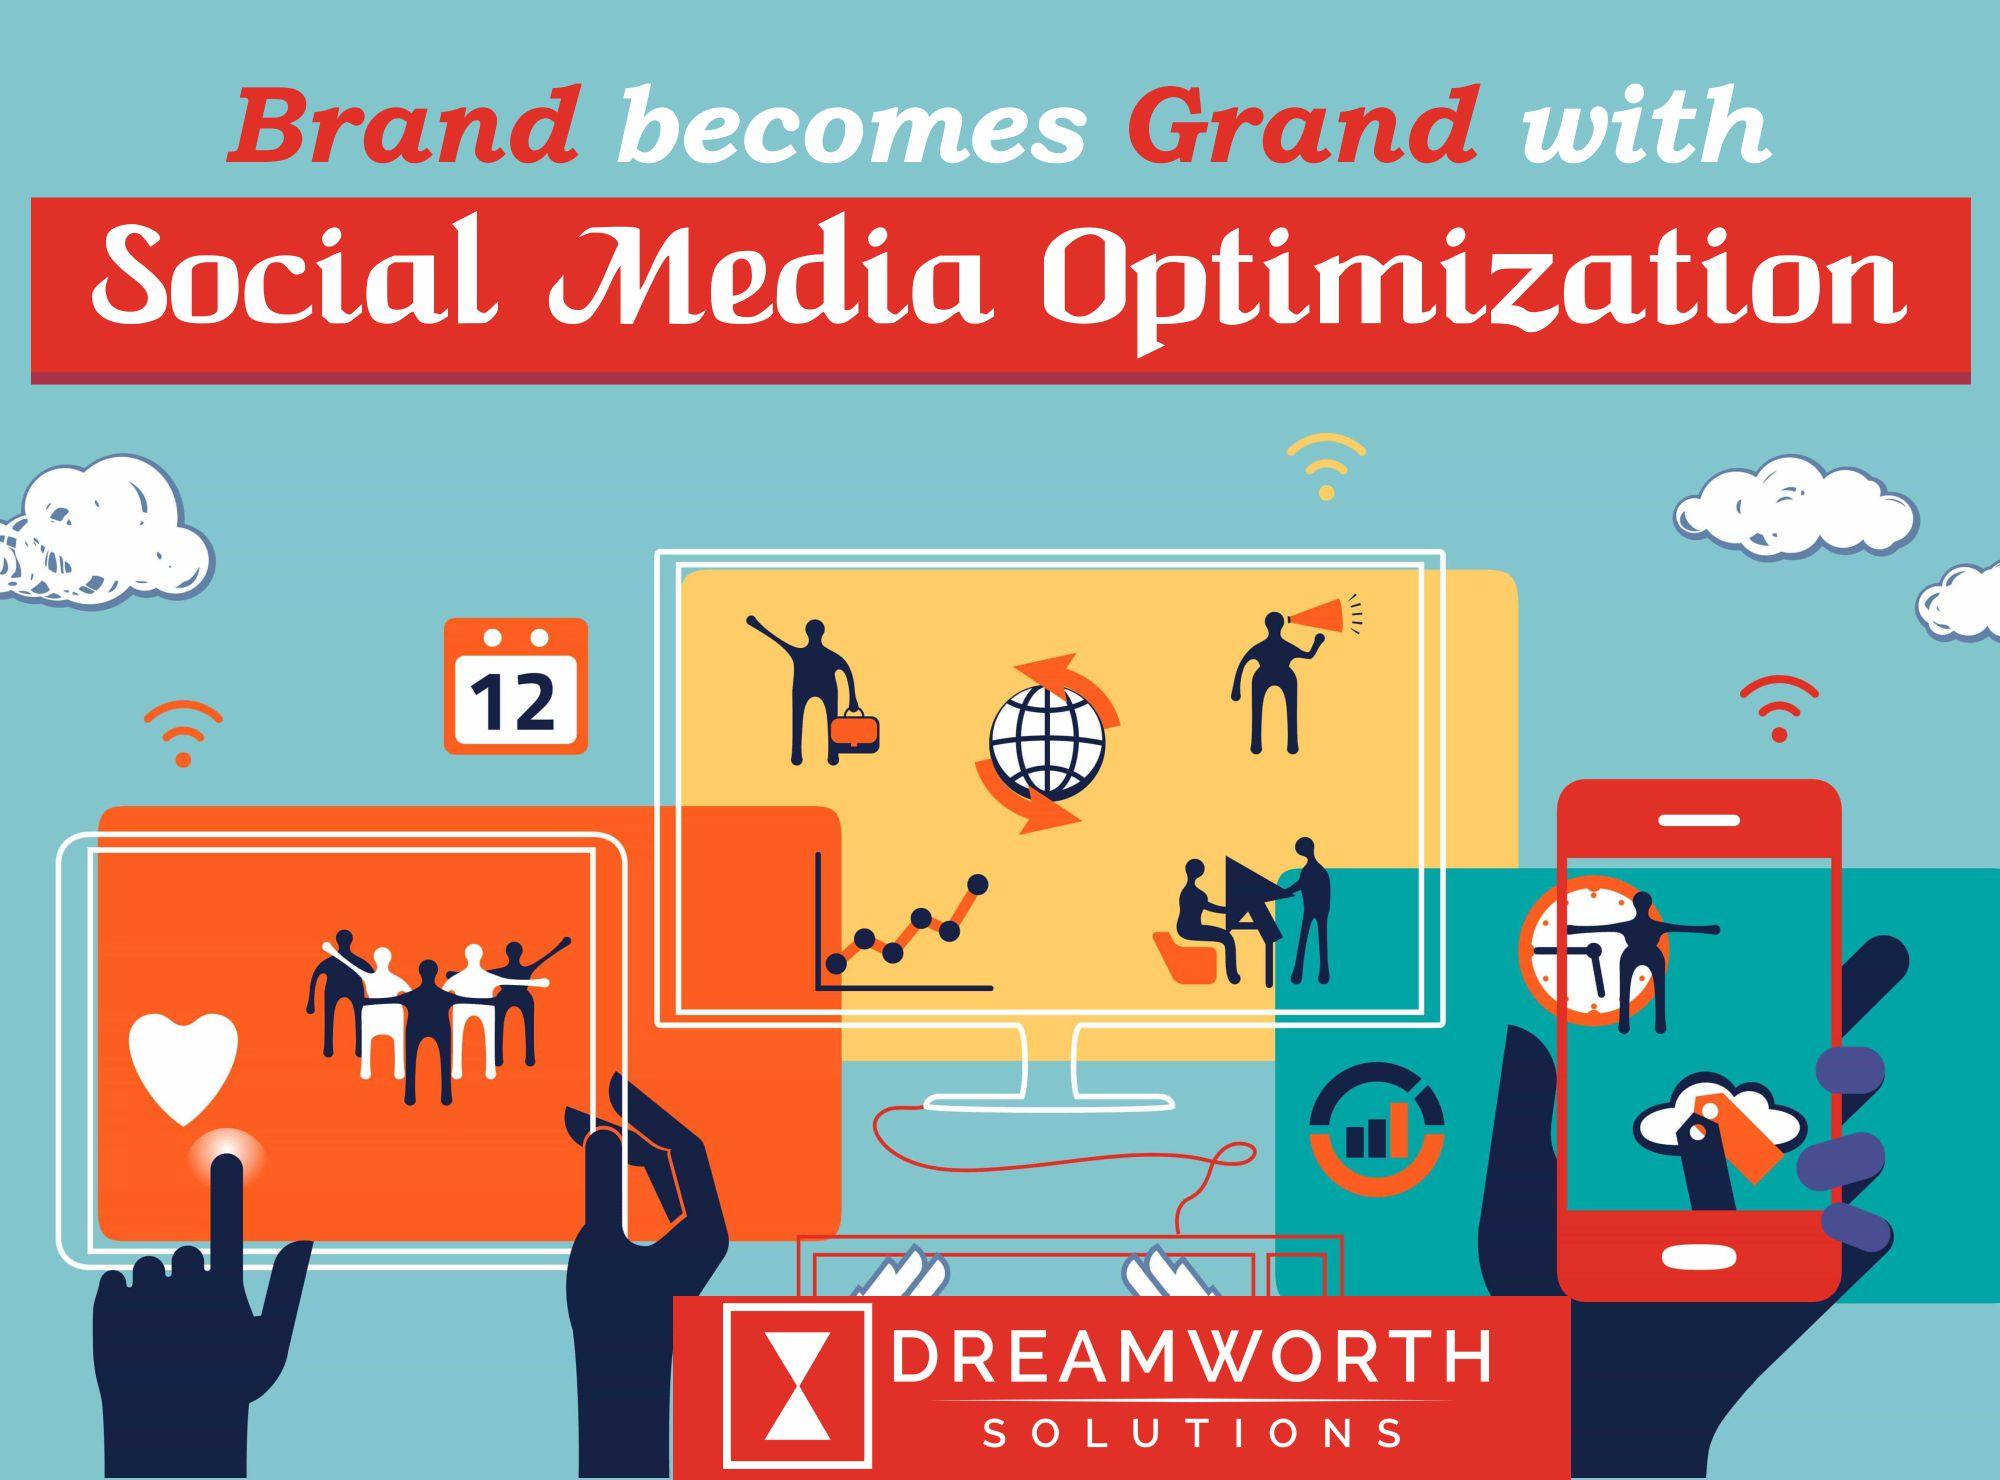 Dreamworth provides Brands for the Social Media Optimisation